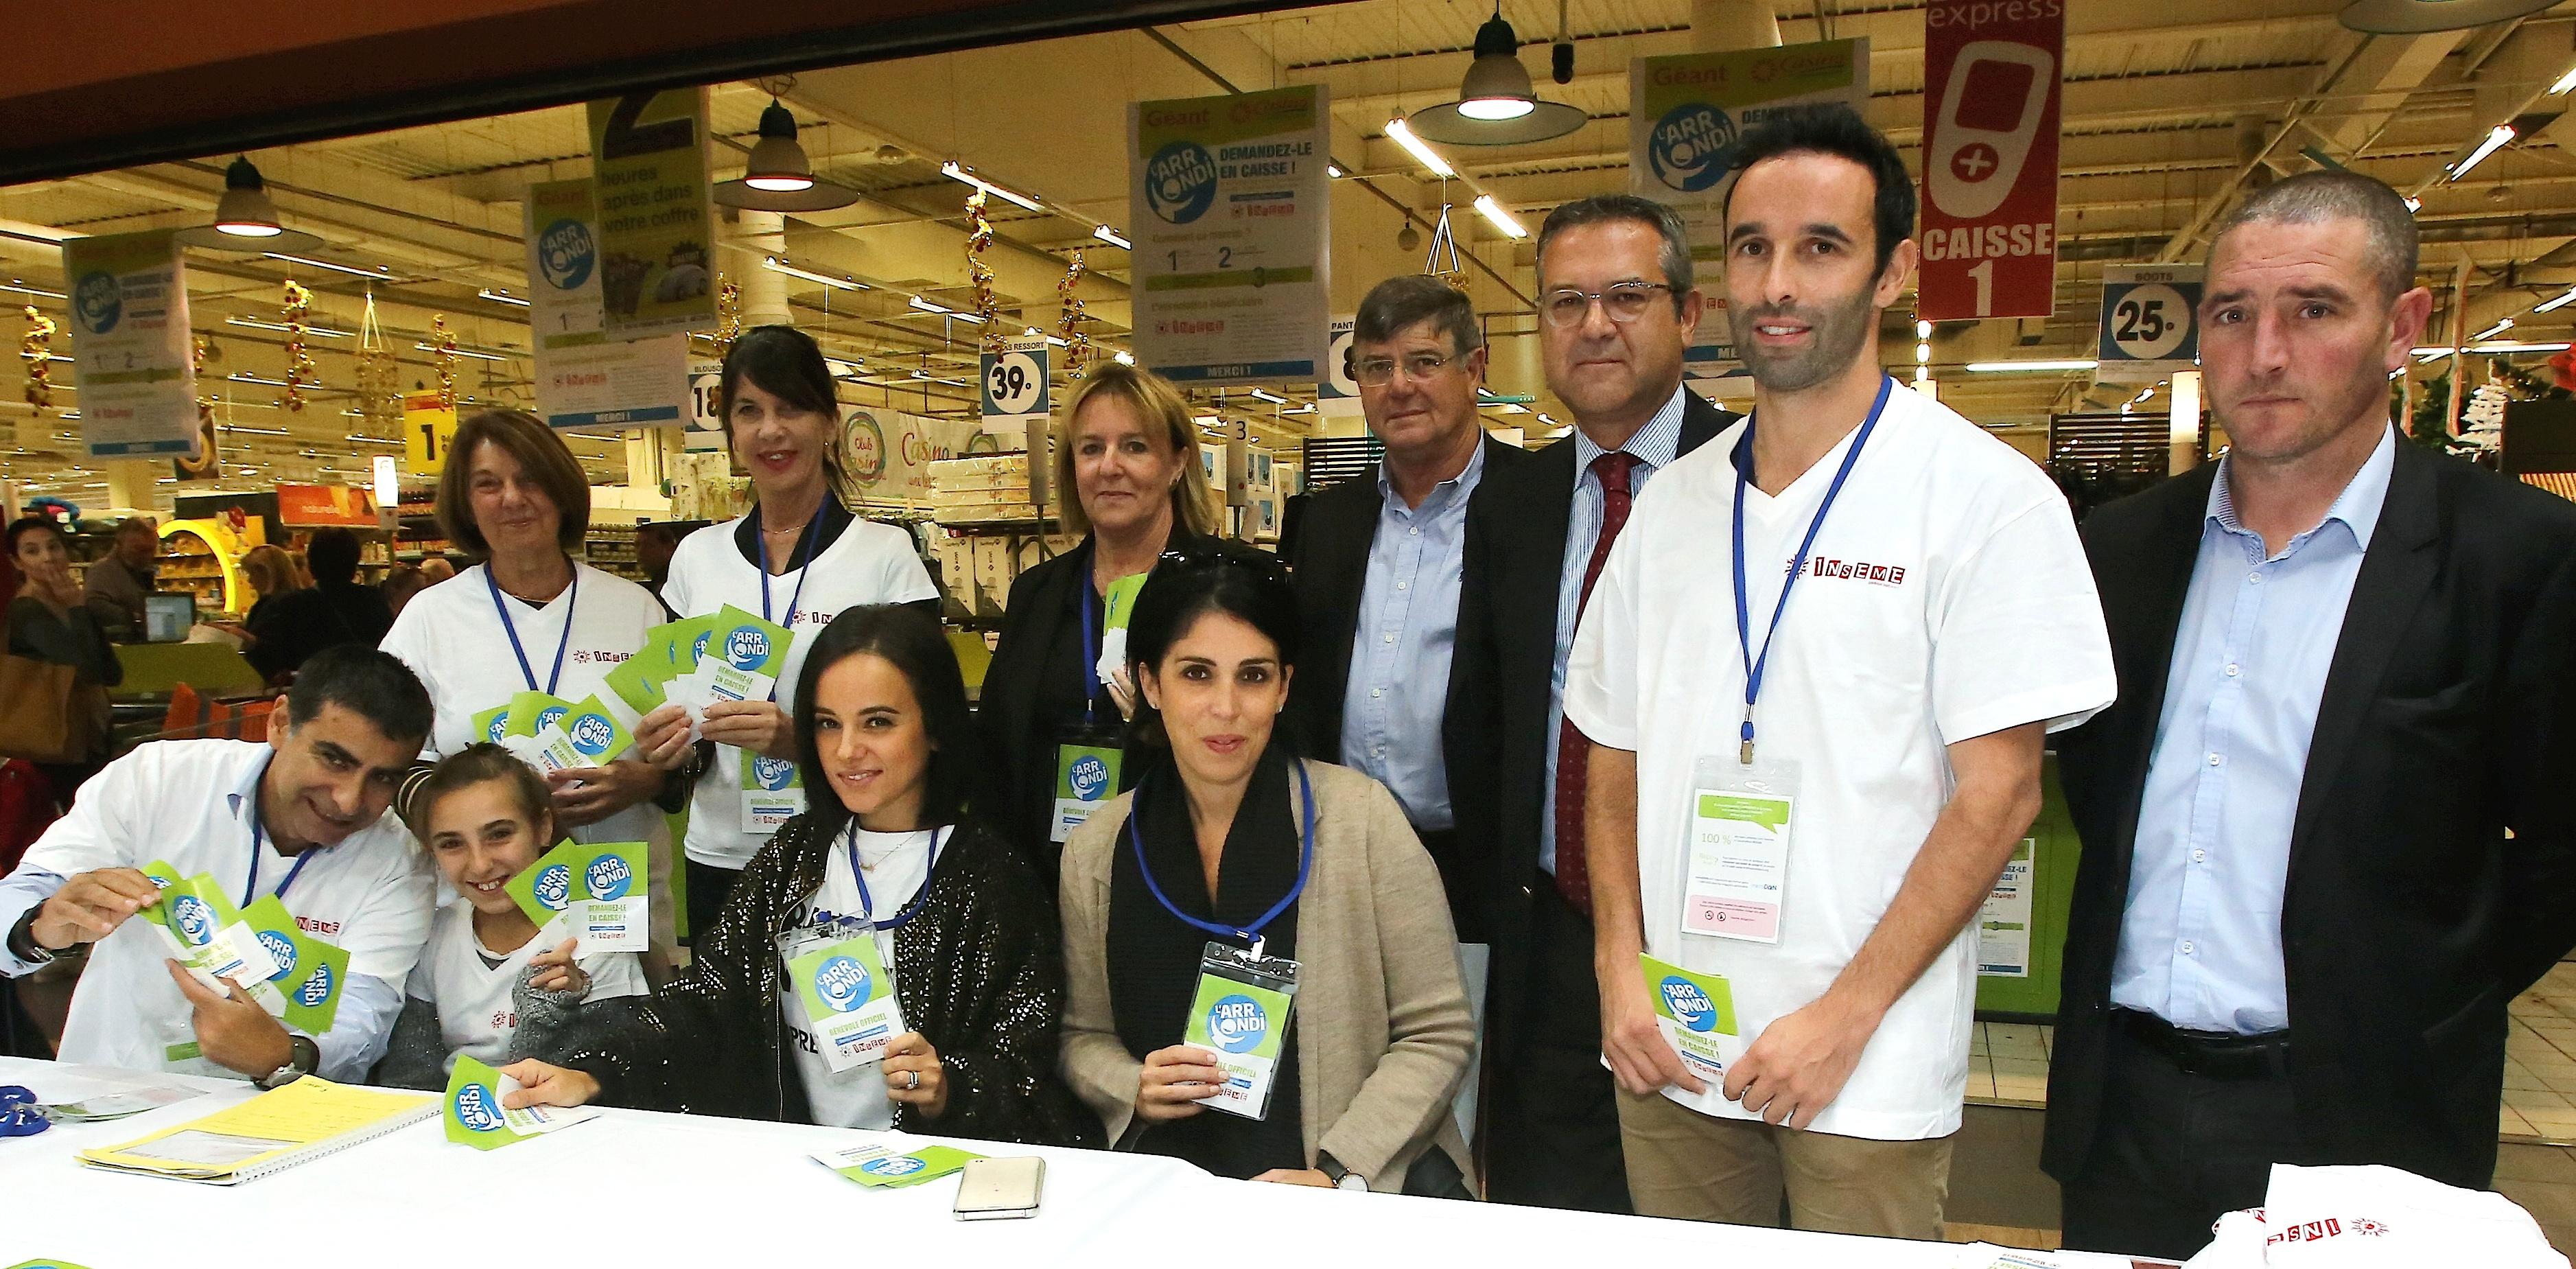 Géant Casino de Mezzavia : « Inseme » relance l'opération « Arrondi » avec Alizée